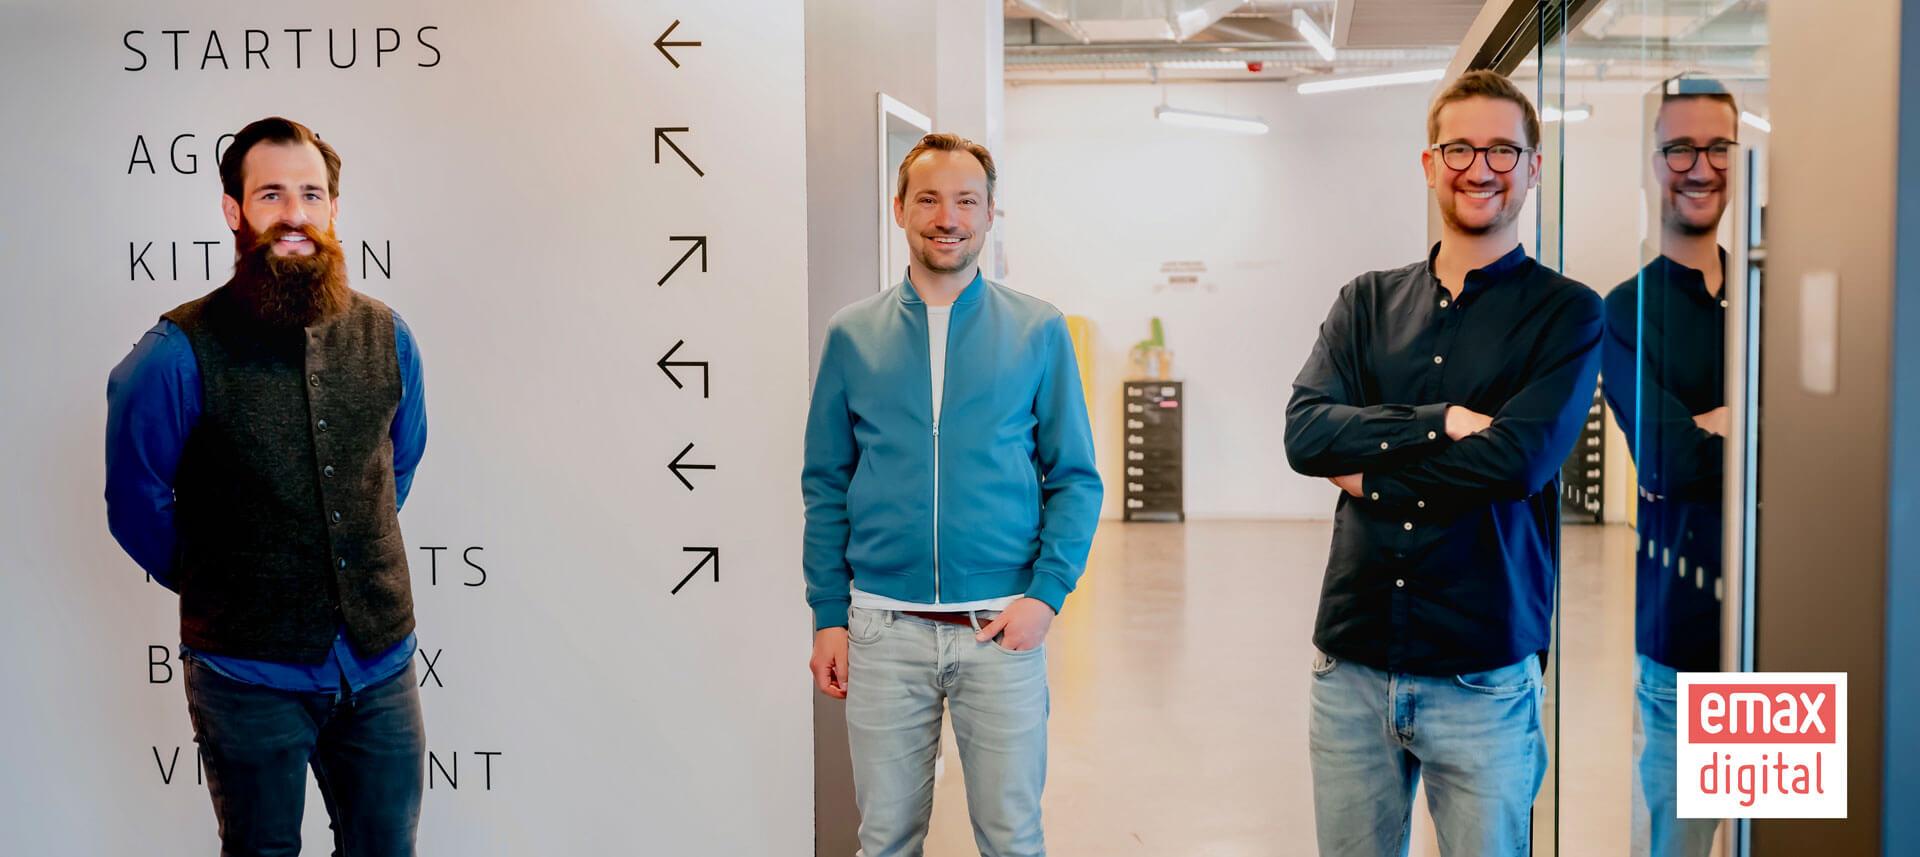 emax digital founders